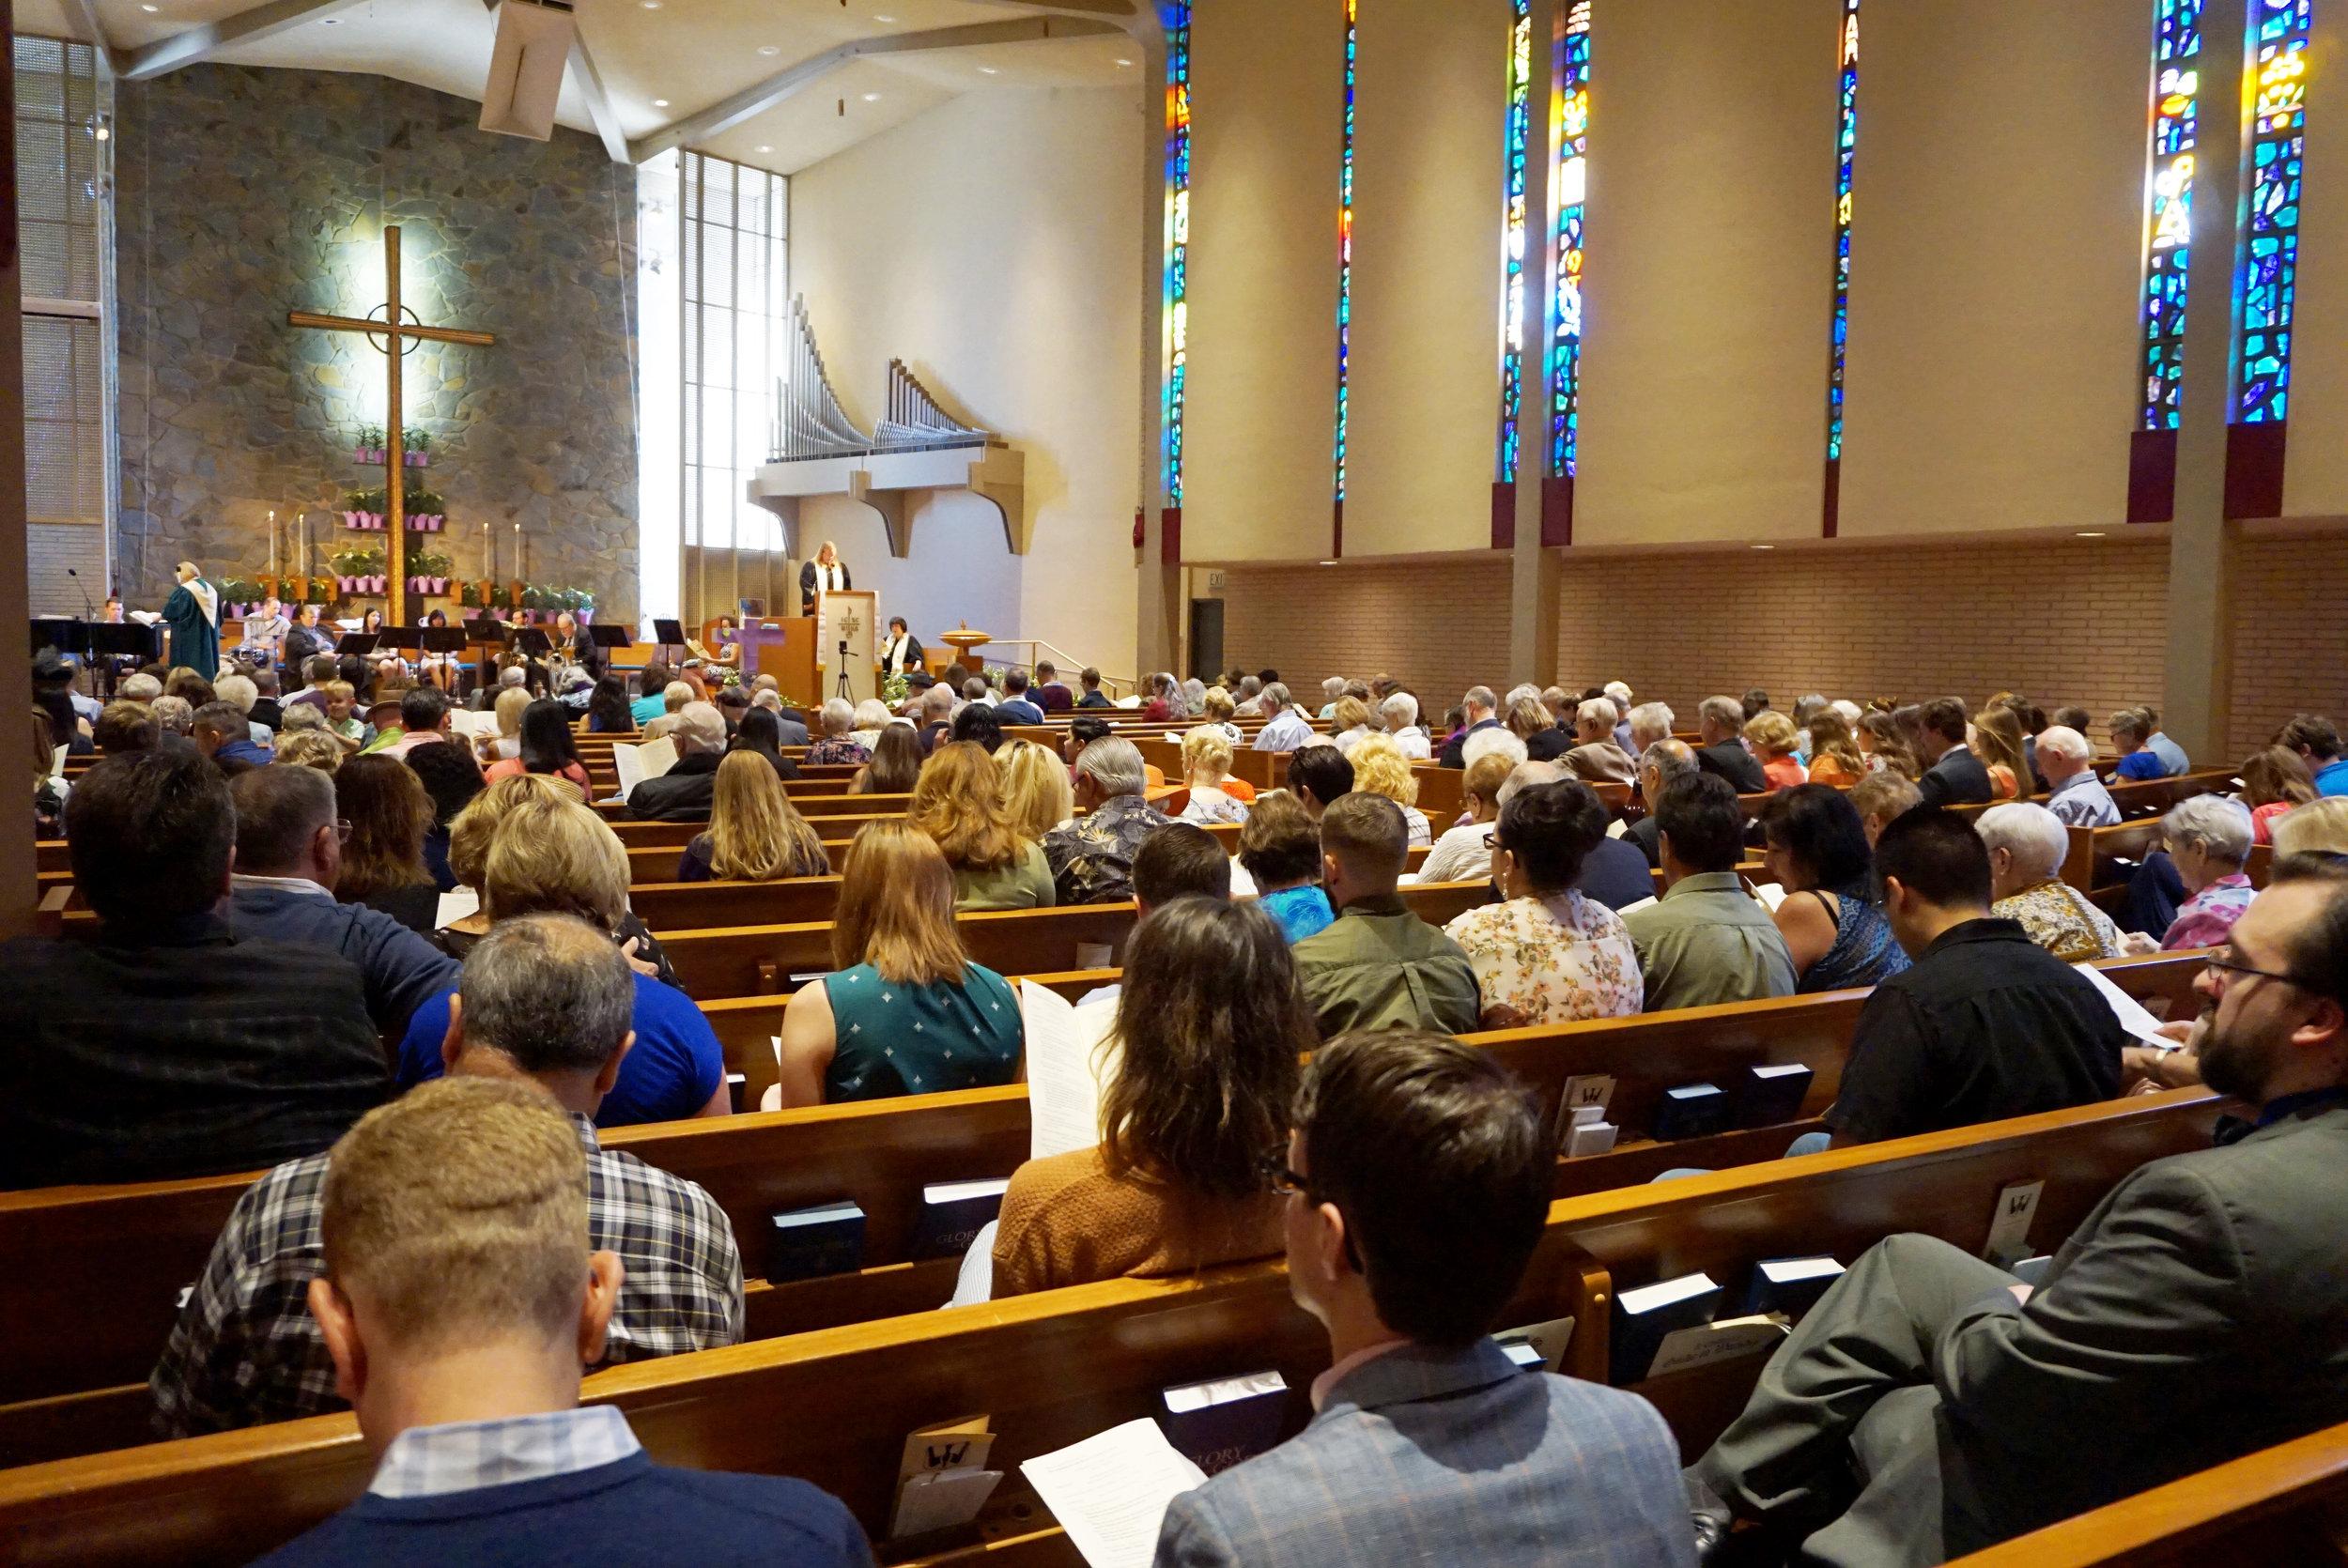 Claremont-Presbyterian-Church-Congregation-13.jpg